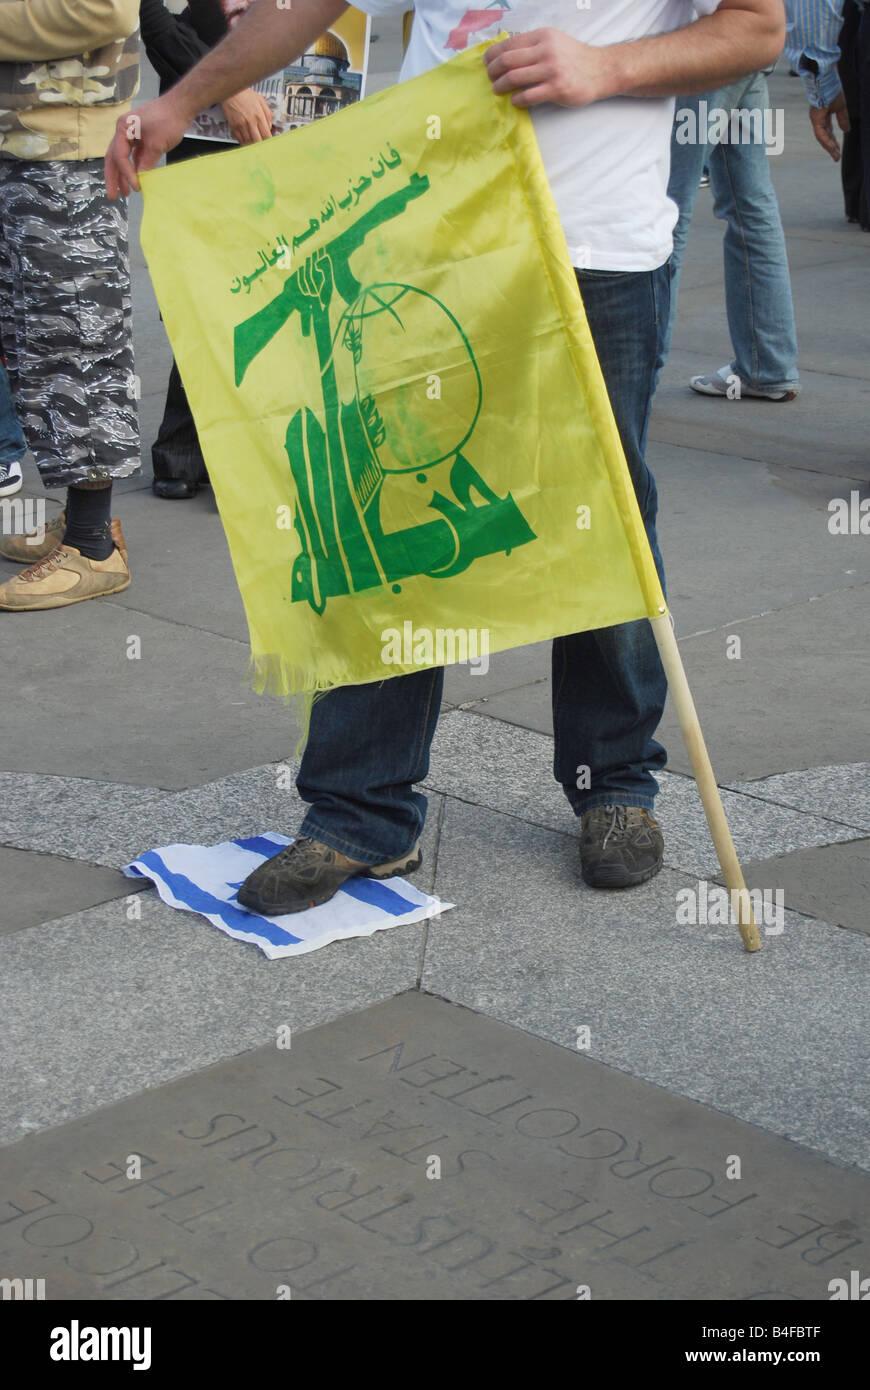 Hezbullah protest 'International Al quds day' London 2008 - Stock Image